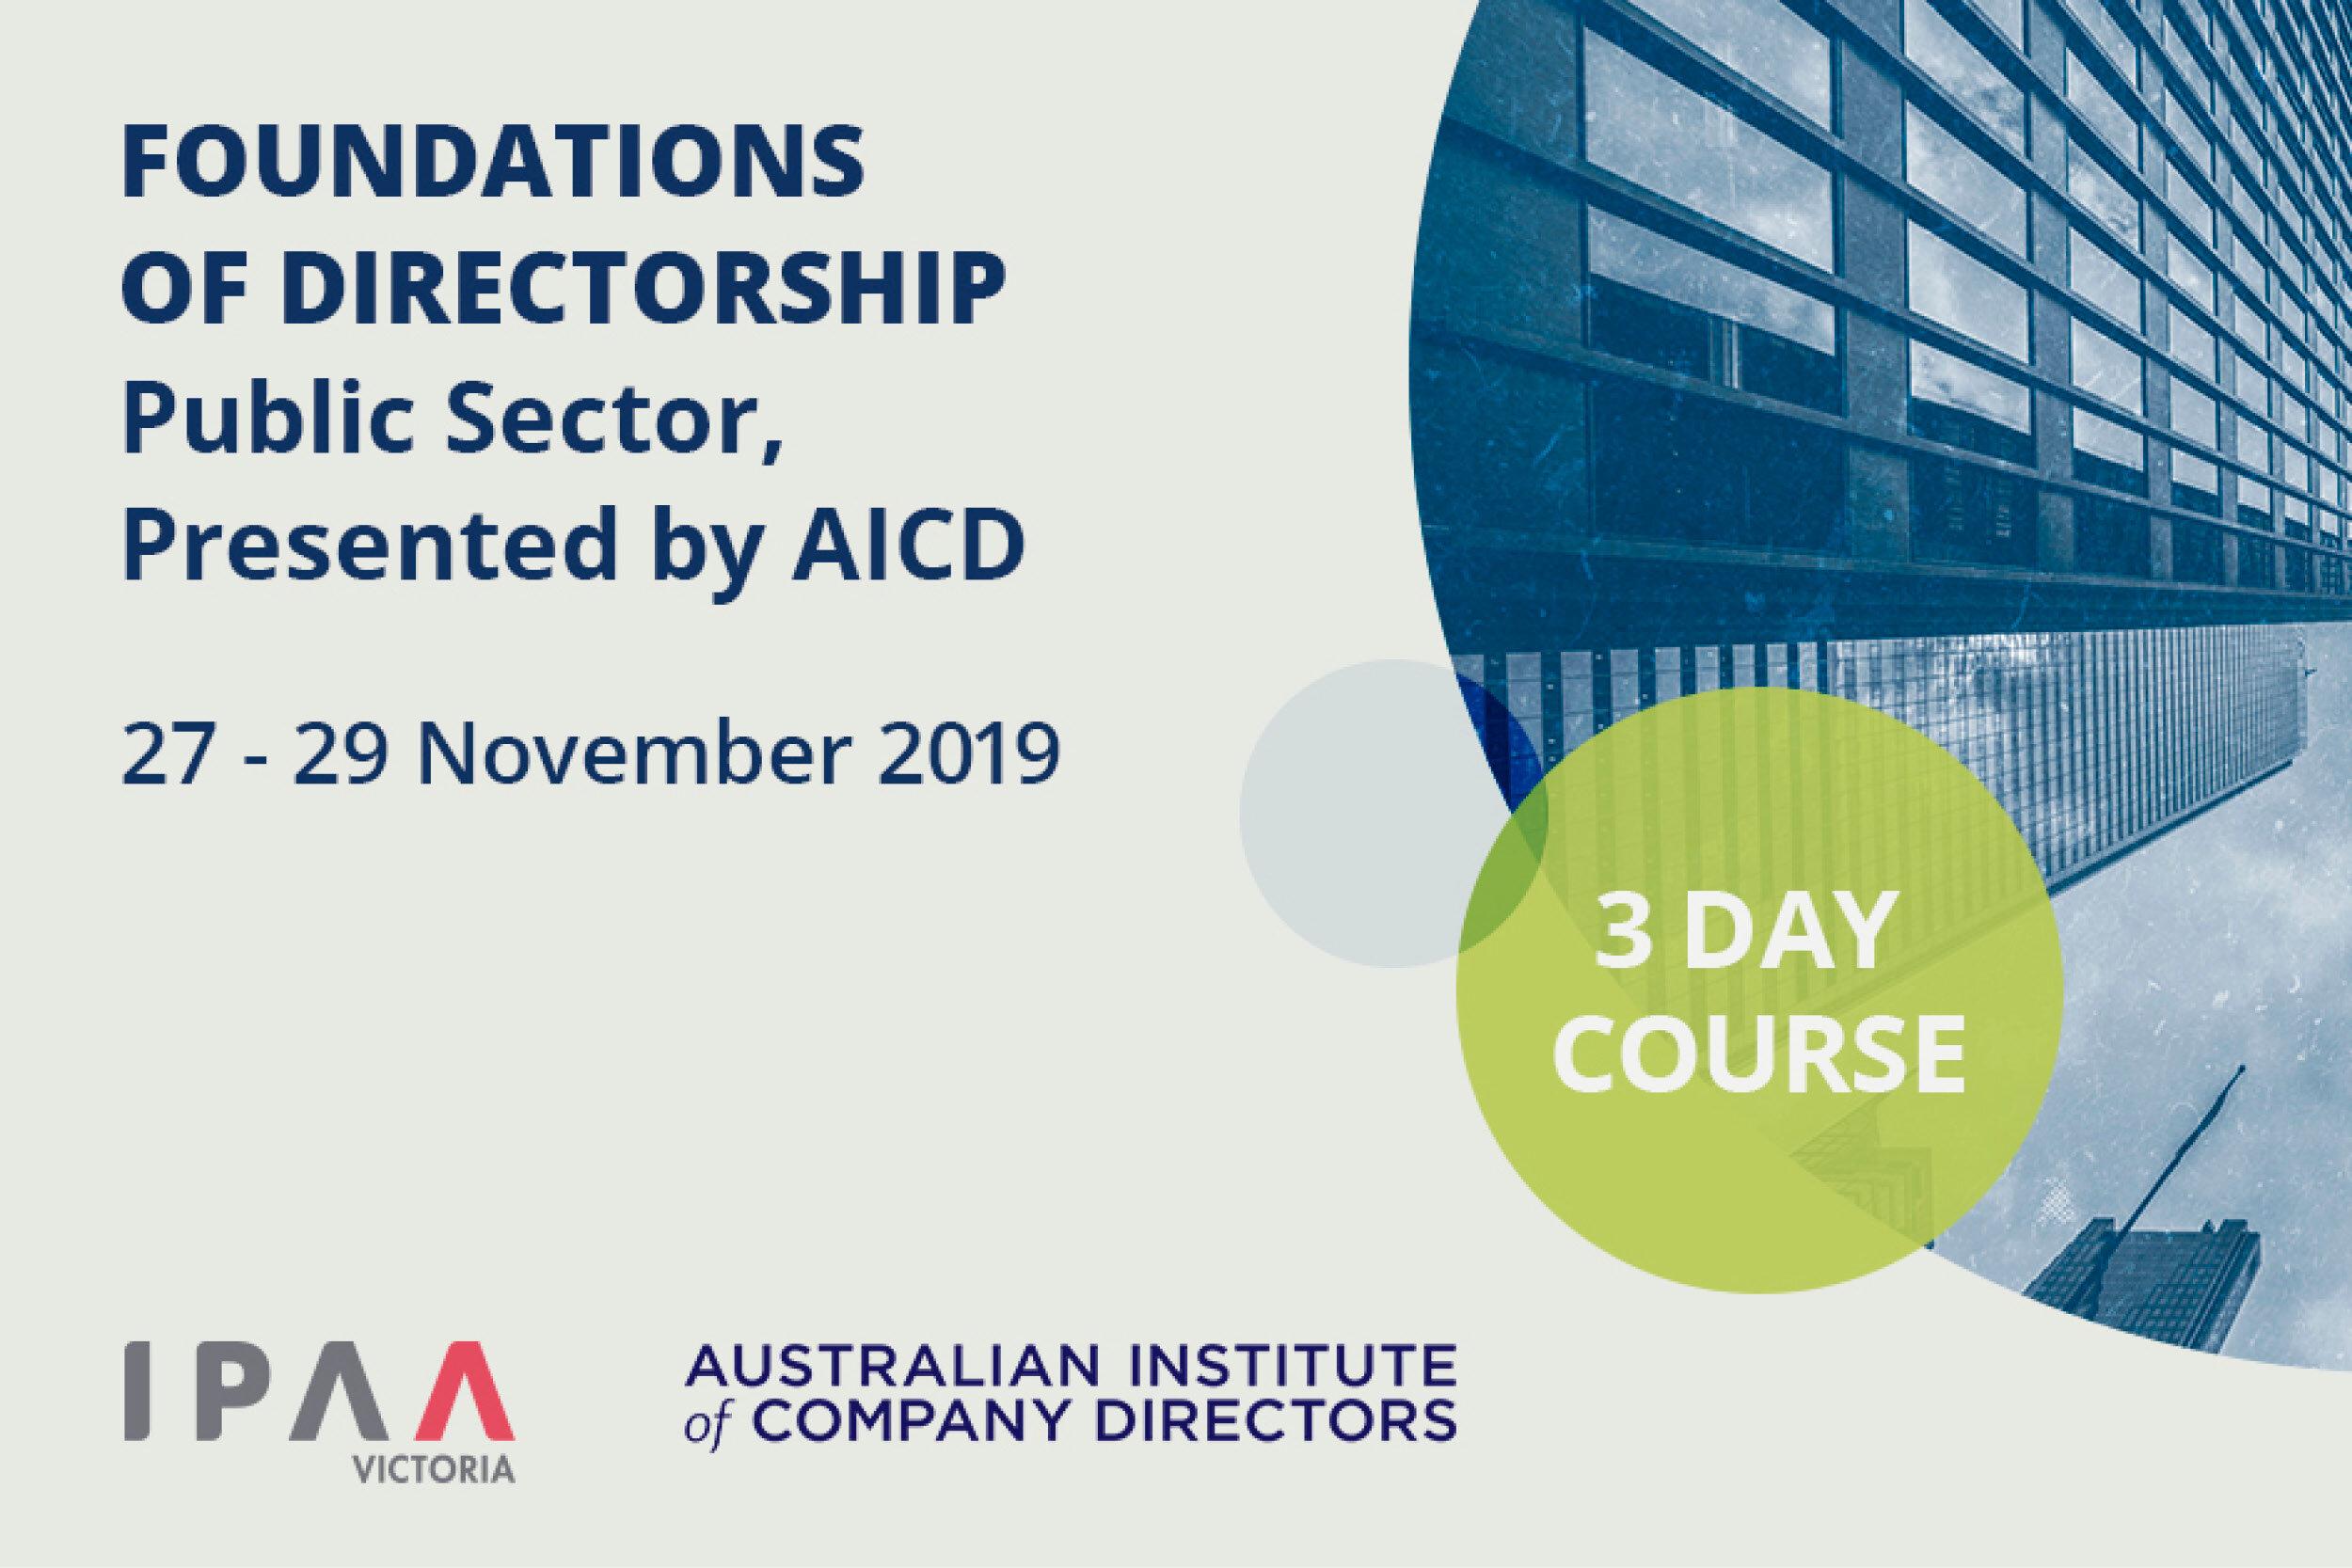 Foundations of Directorship